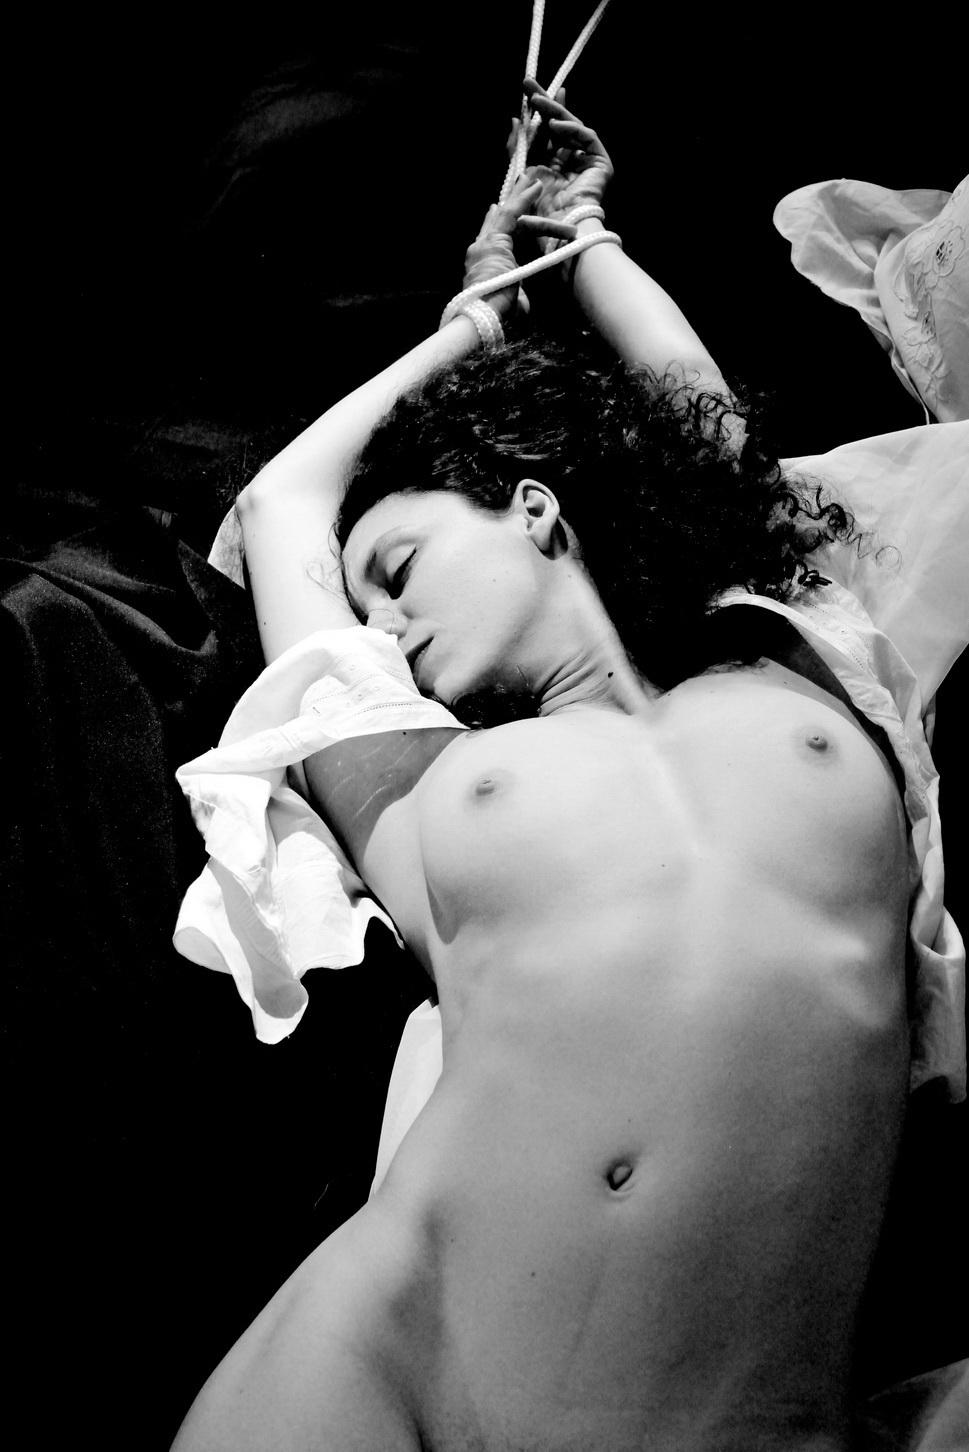 AMILCAR MORETTI. Sábado 9 de enero 2016, medianoche. Modelo: Aurélie Meninnger. Argentina.